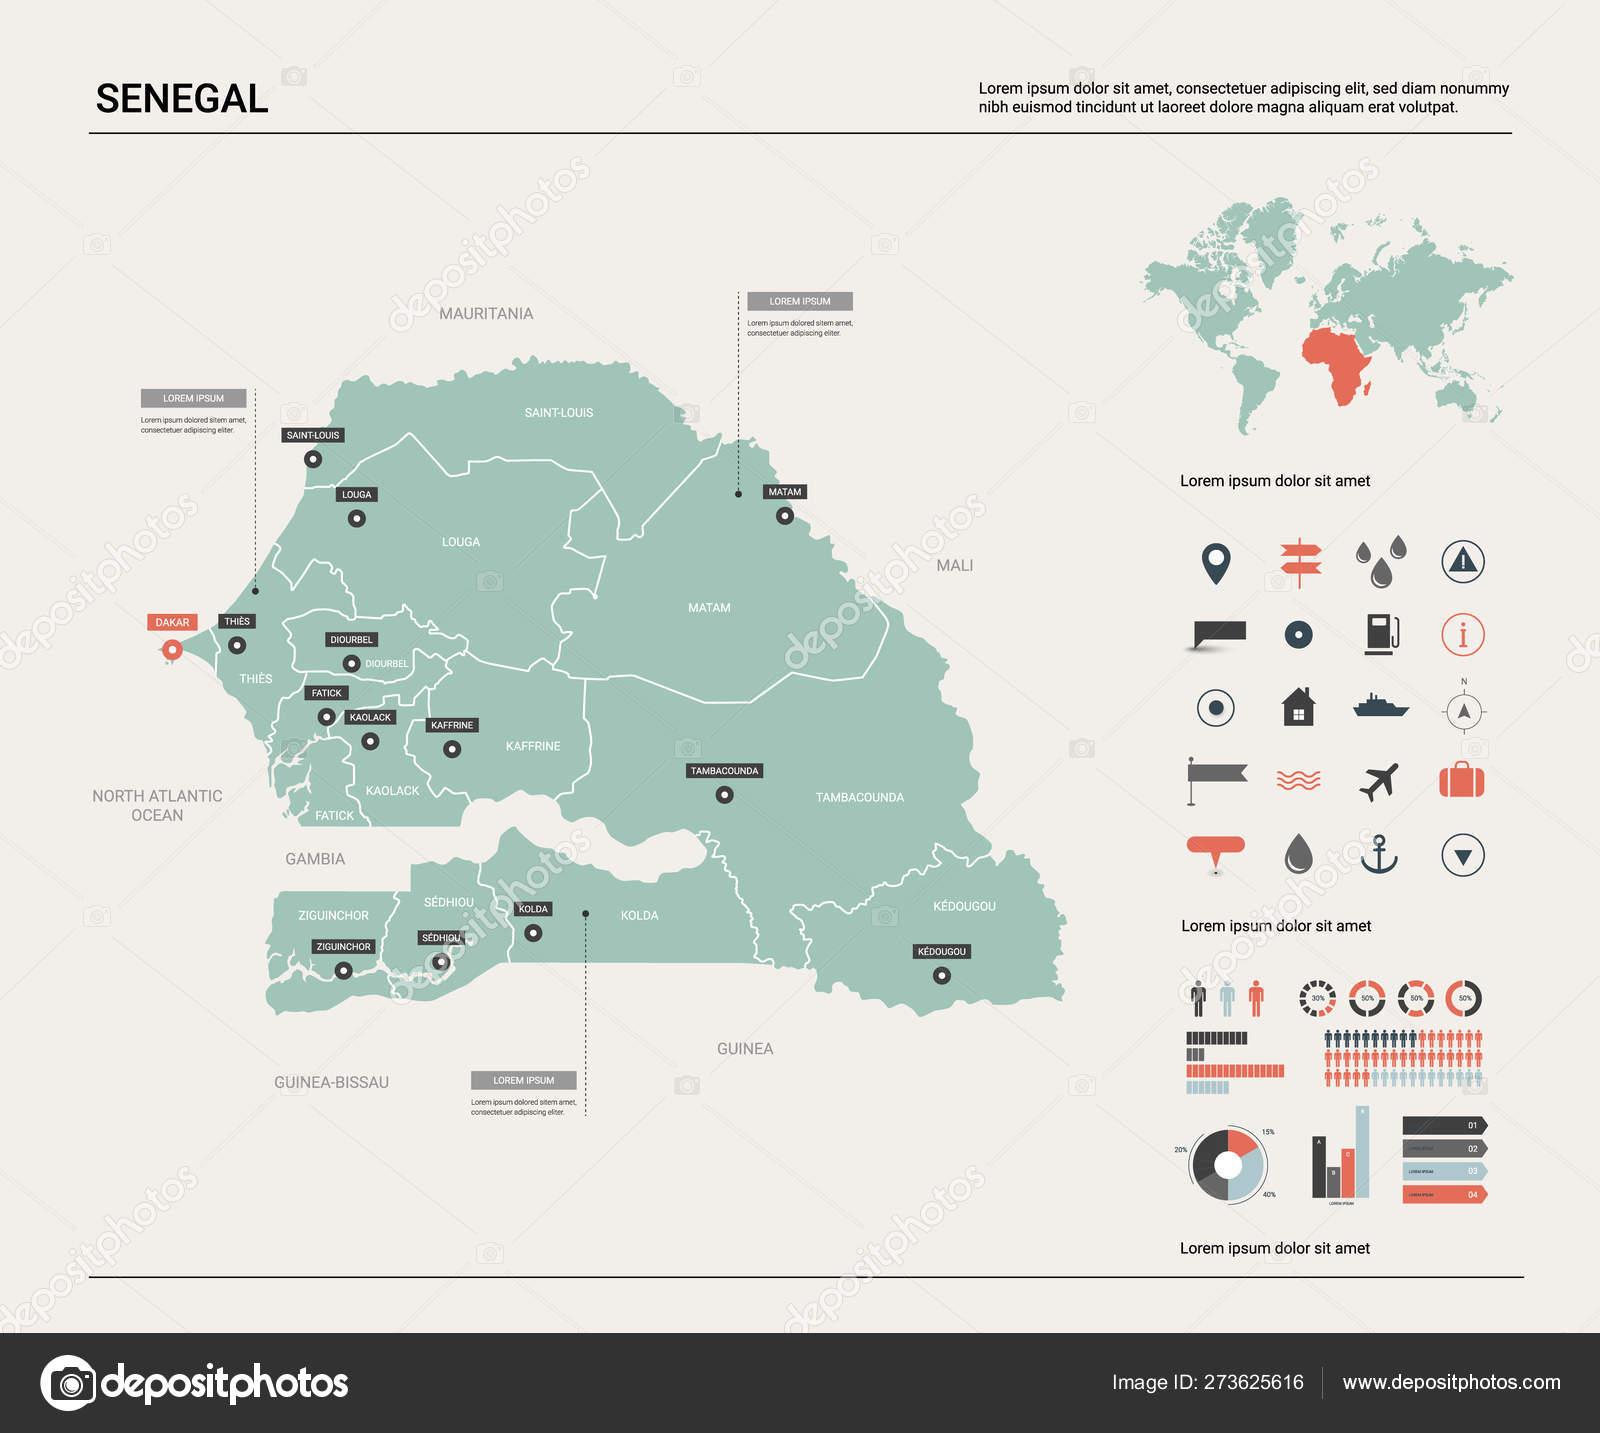 Vector map of Senegal. — Stock Vector © molokowall #273625616 on rwanda map, bangladesh map, seychelles map, morocco map, madagascar map, the gambia map, turkey map, tunisia map, namibia map, sudan map, benin map, algeria map, cameroon map, africa map, lesotho map, eritrea map, mali map, niger map, nigeria map, gabon map, malawi map, zimbabwe map, ethiopia map, ghana map, nepal on map, singapore map, denmark map, uganda map, dakar map, syria map, angola map, political map, guinea map, kenya map, mozambique map, tanzania map,